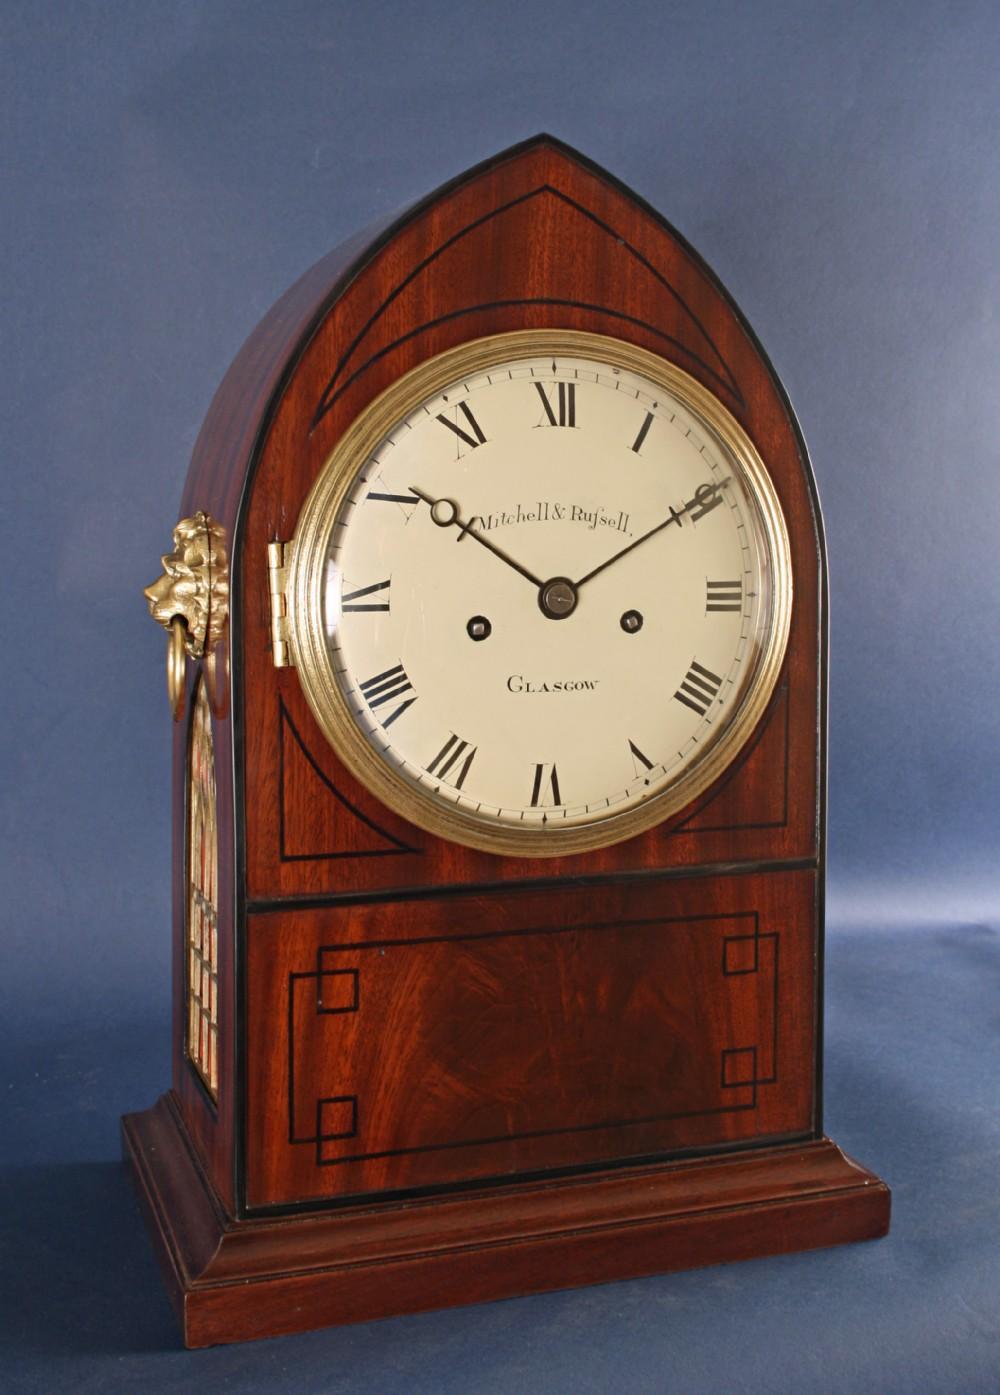 scottish bracket clock by mitchell russell of glasgow